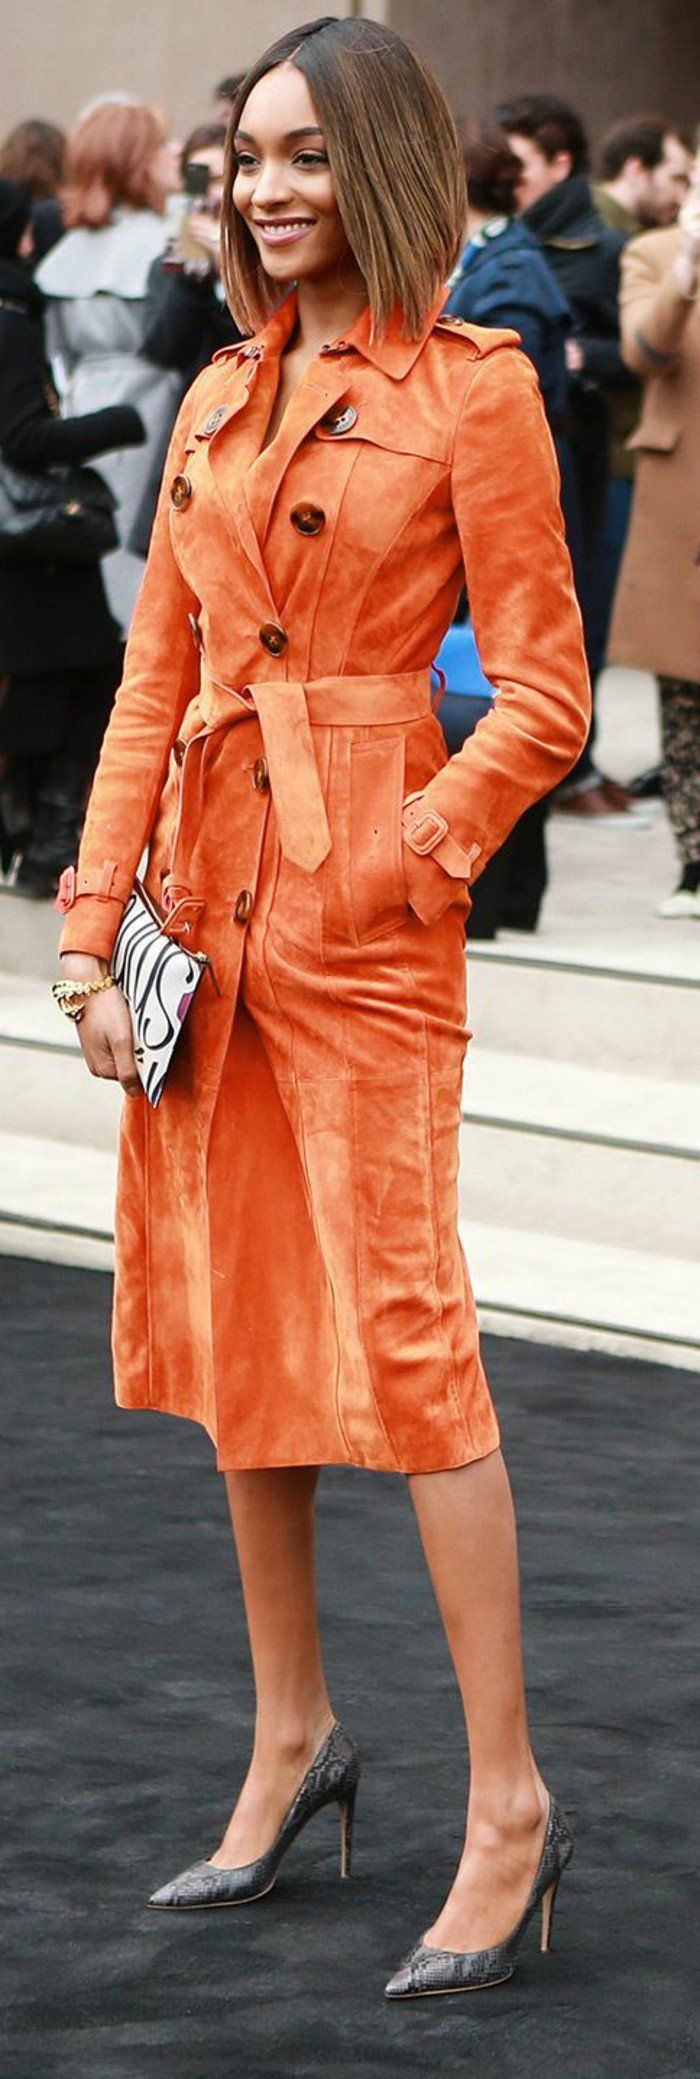 trench femme en orange vif bonne mine